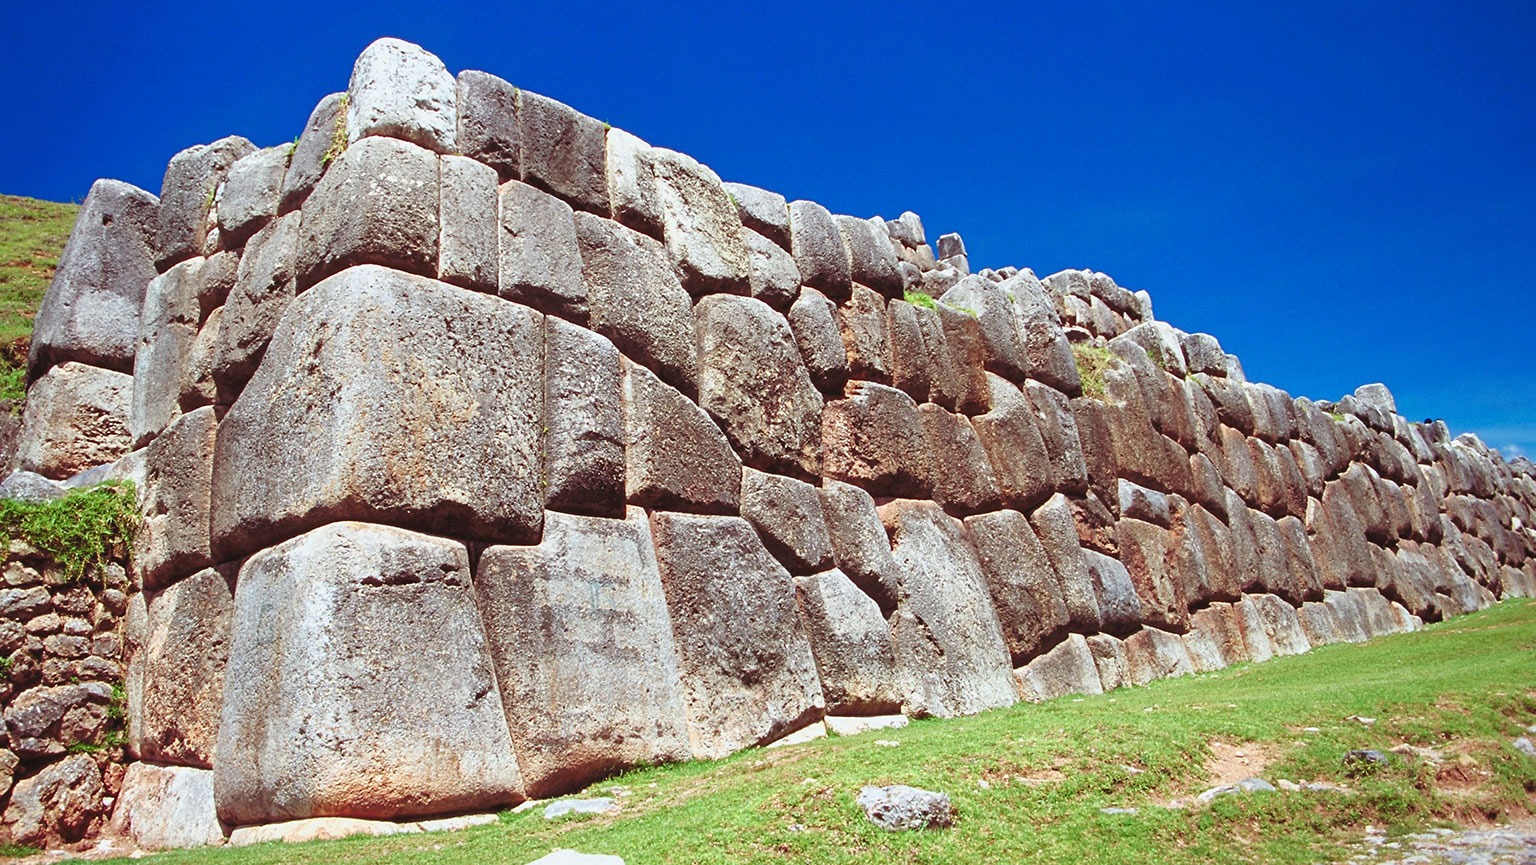 Cuzco and the Tawantinsuyu Empire